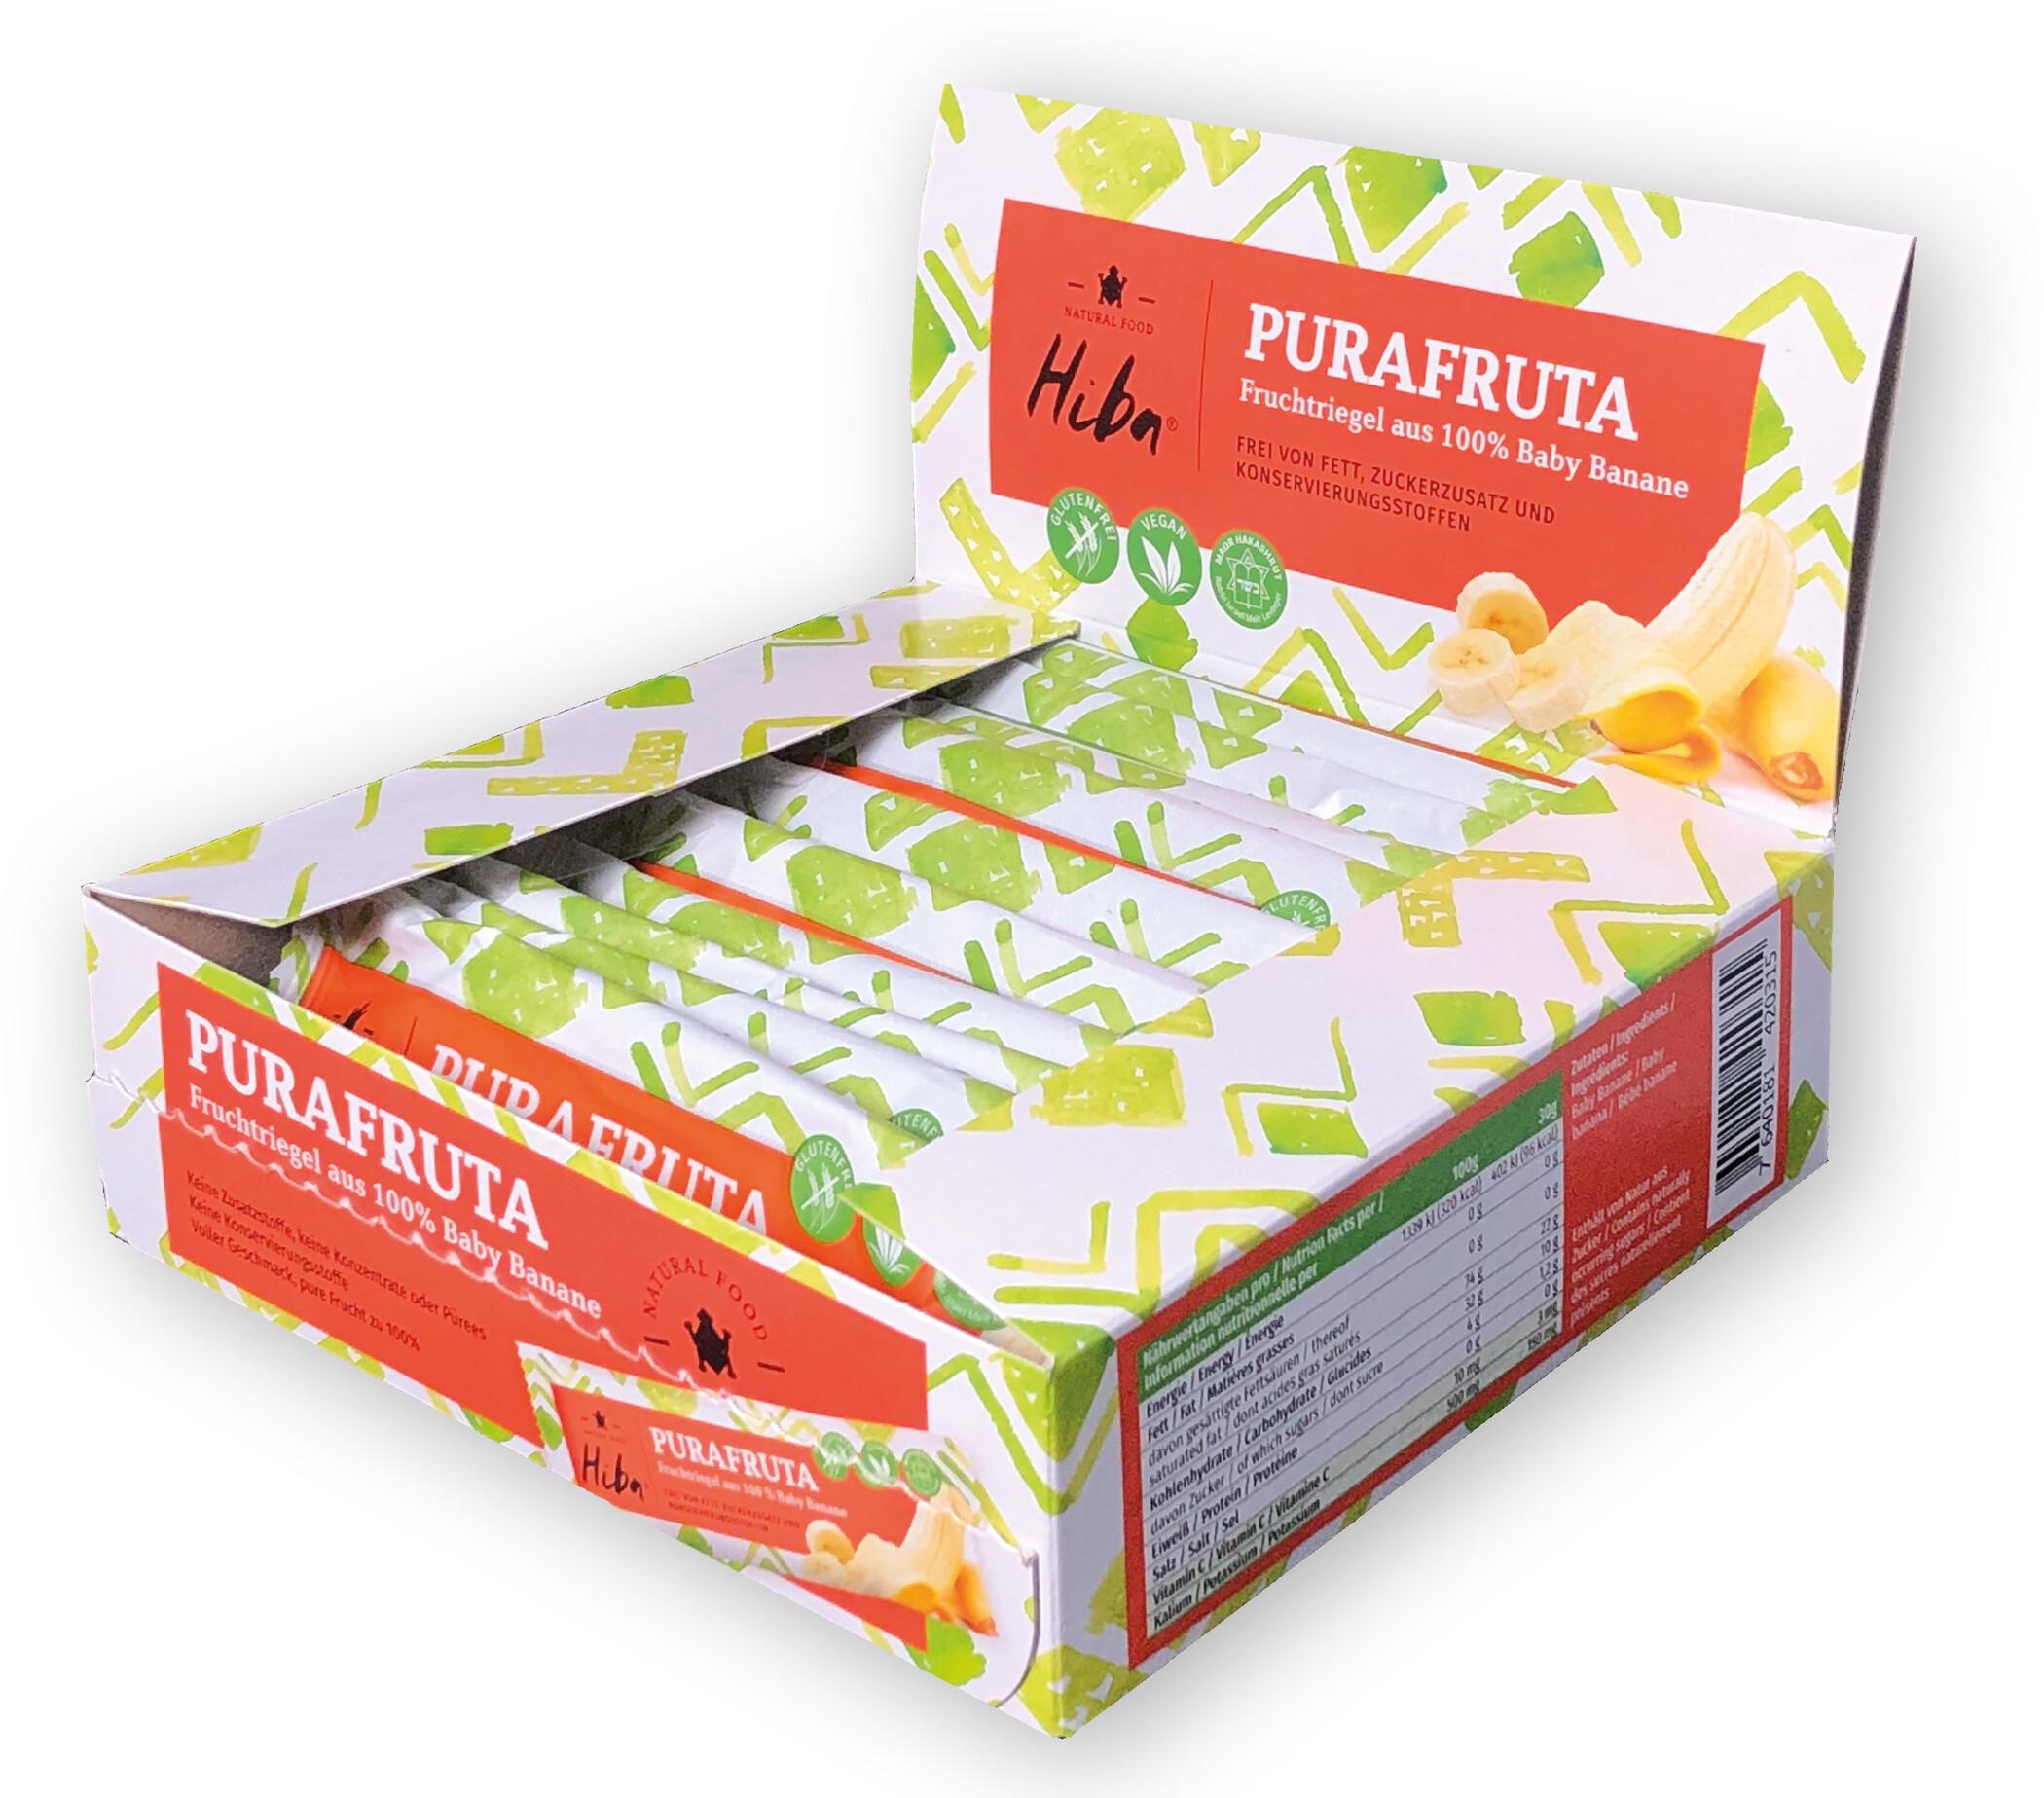 Hiba Purafruta Energy Bar Box 12x30g, Baby Banana (2019) | Energy bar